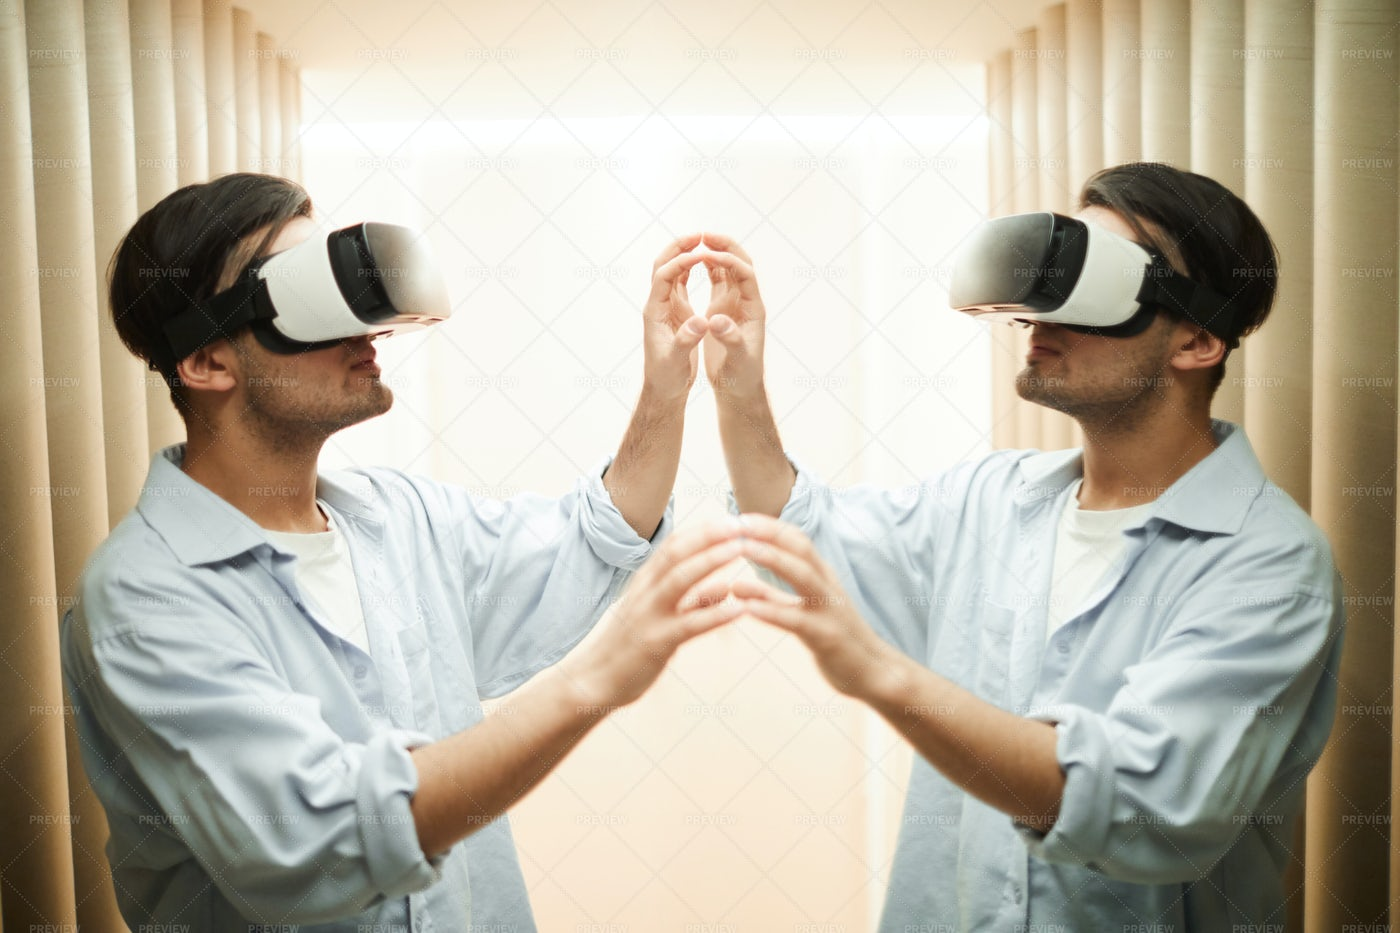 VR Clone: Stock Photos